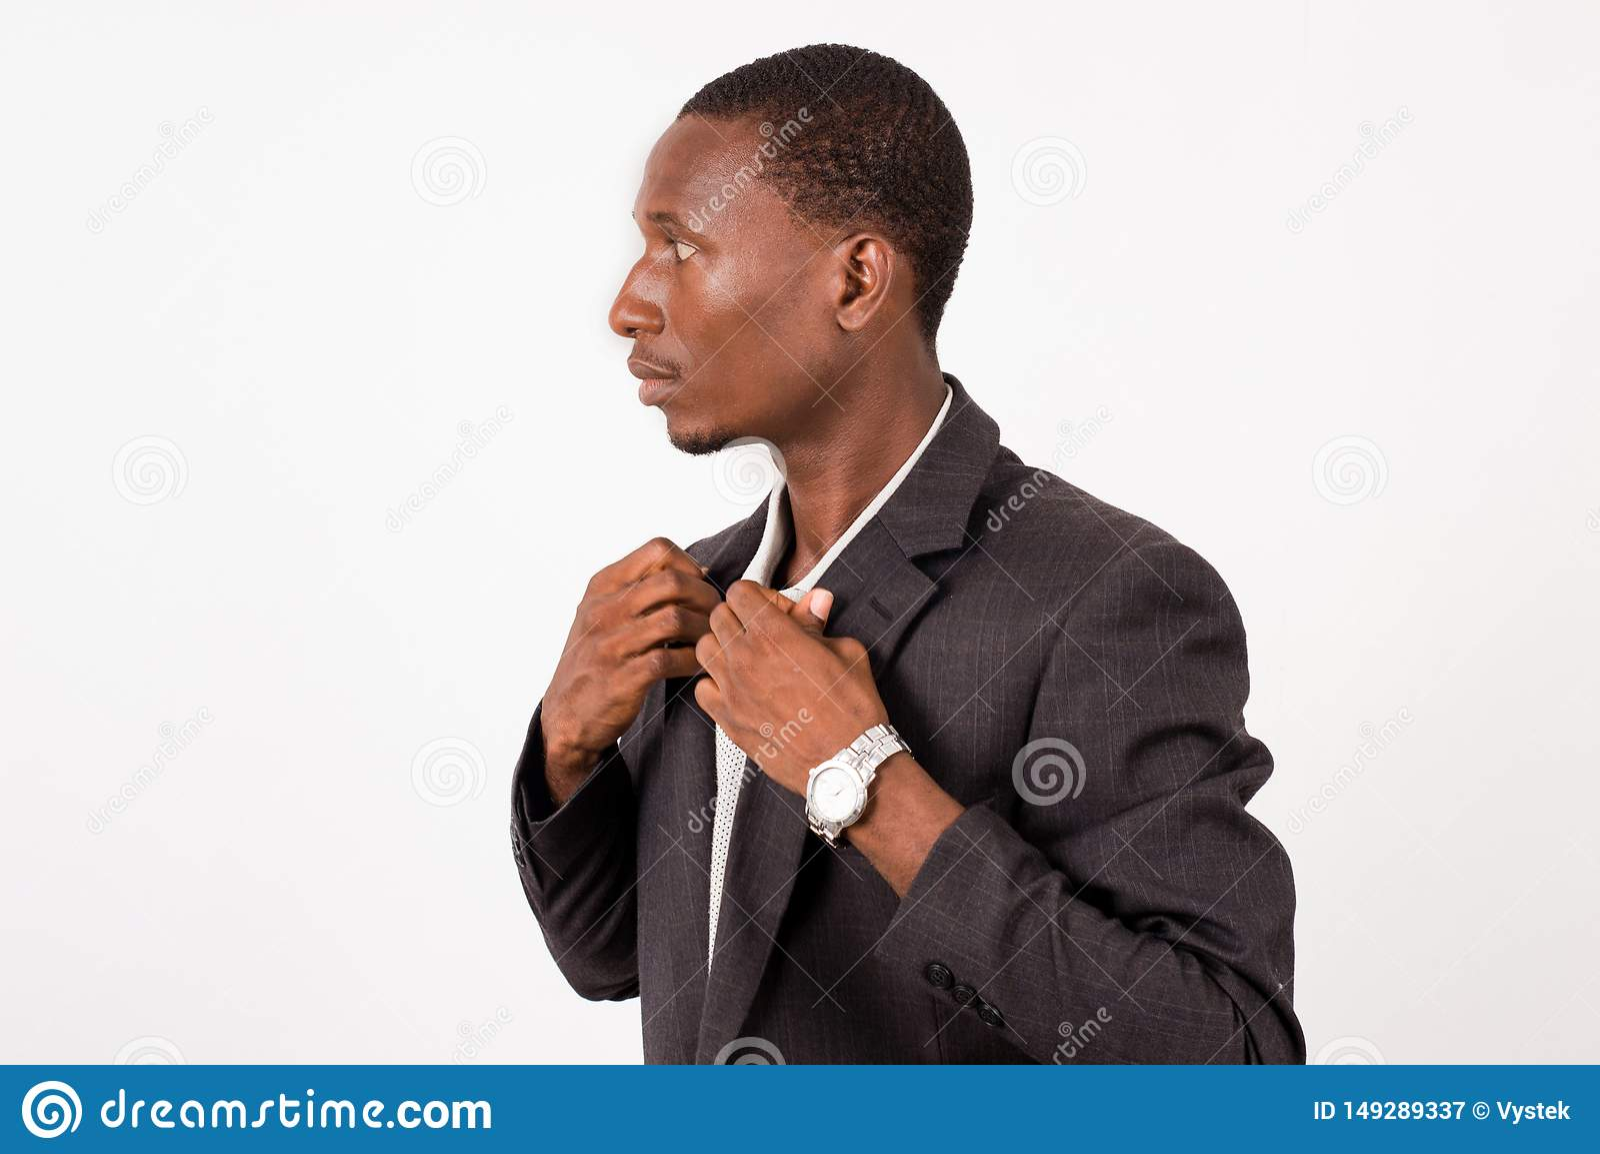 Young businessman standing arranges his shirt glues